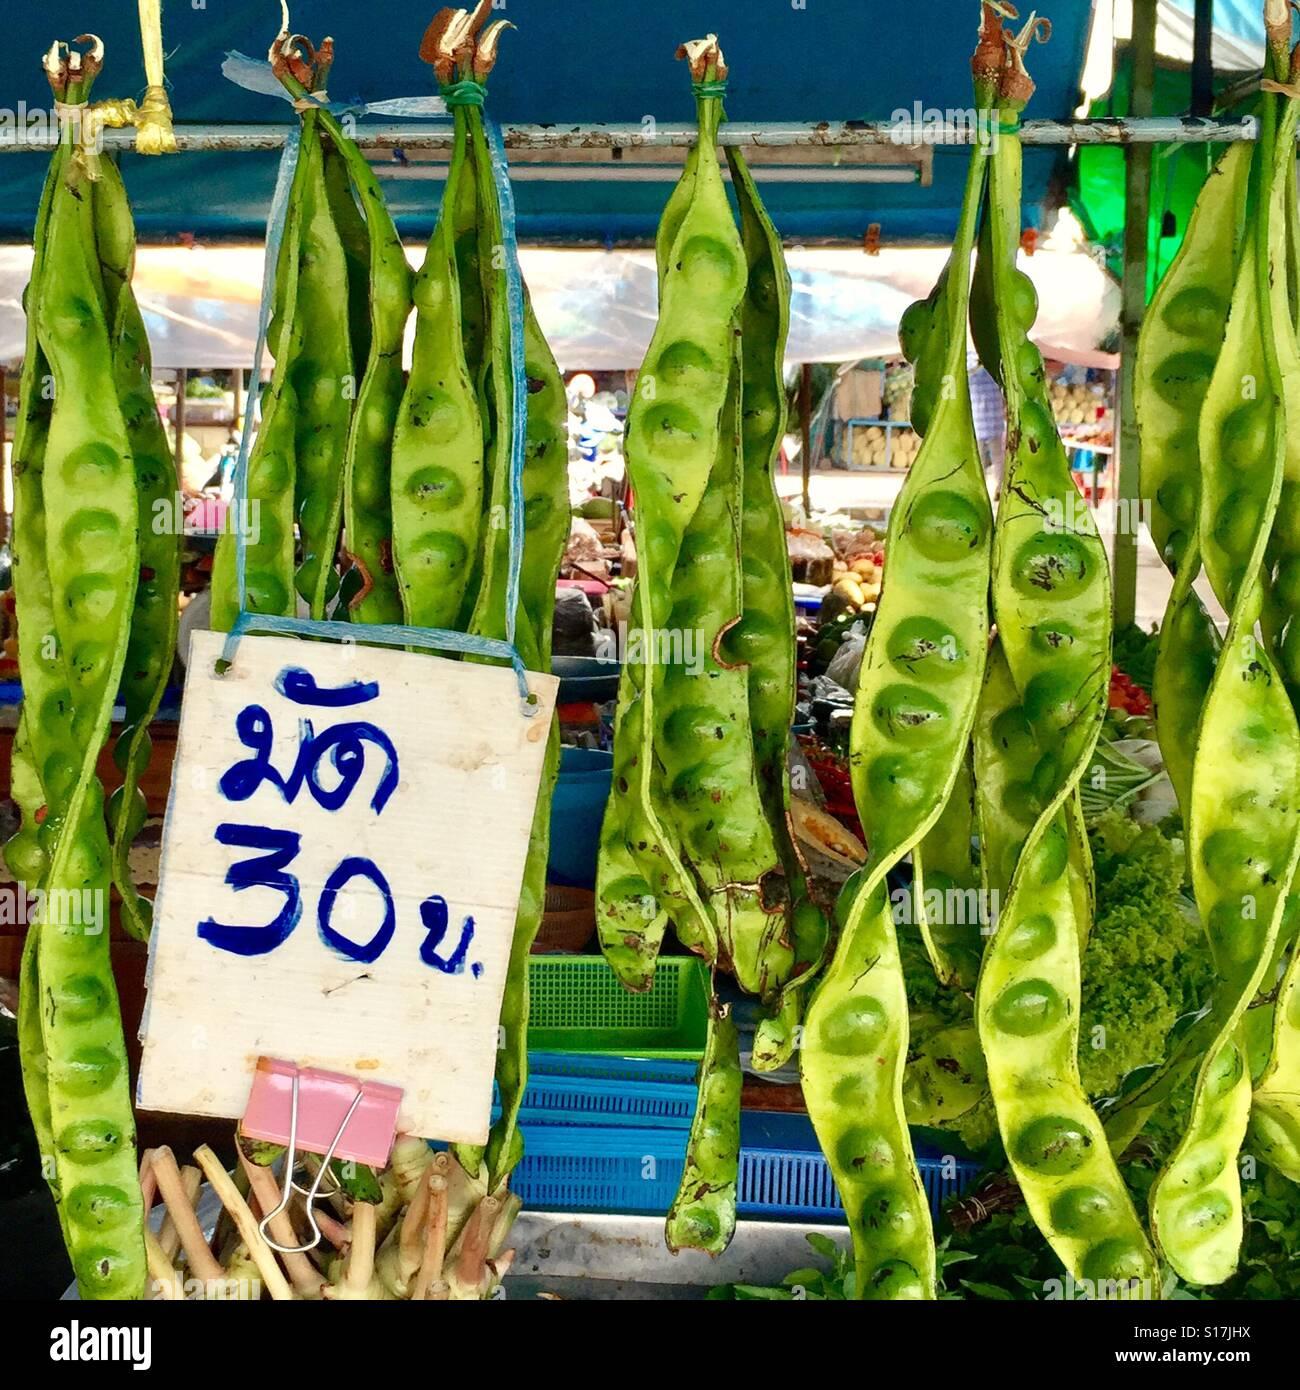 Stinking beans selling at local Thai market, Phuket Old Town,Thailand Stock Photo